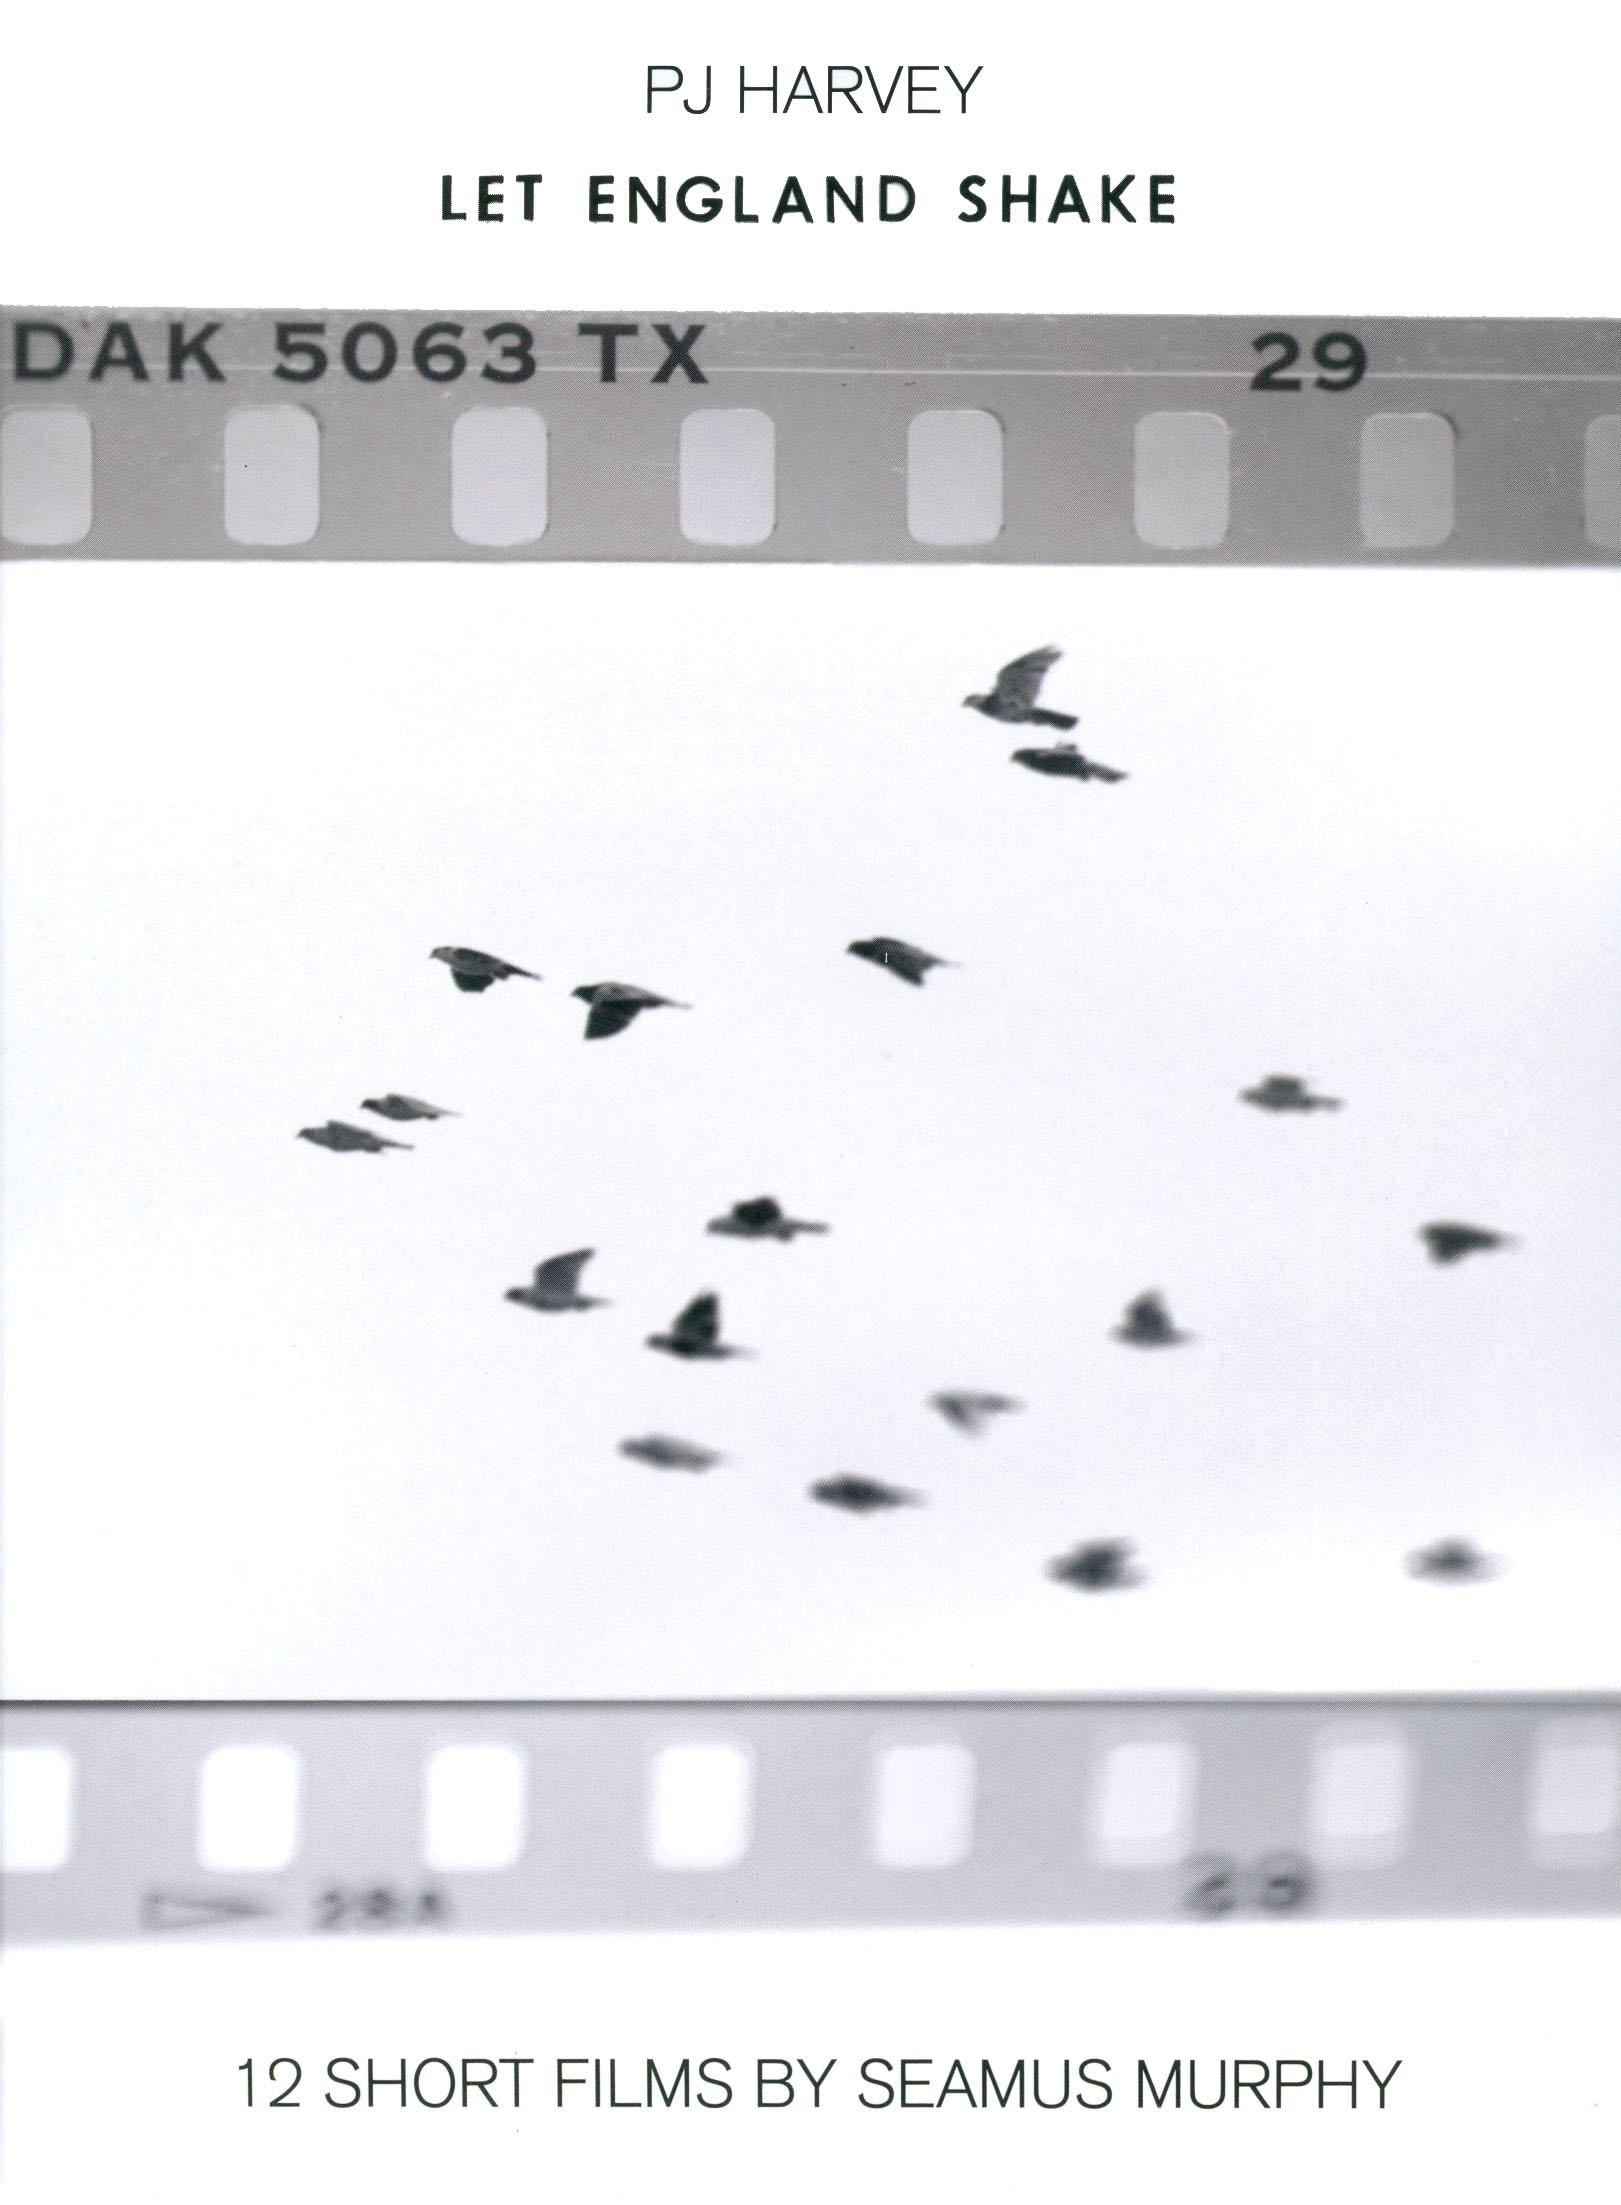 PJ Harvey: Let England Shake - 12 Short Films by Seamus Murphy